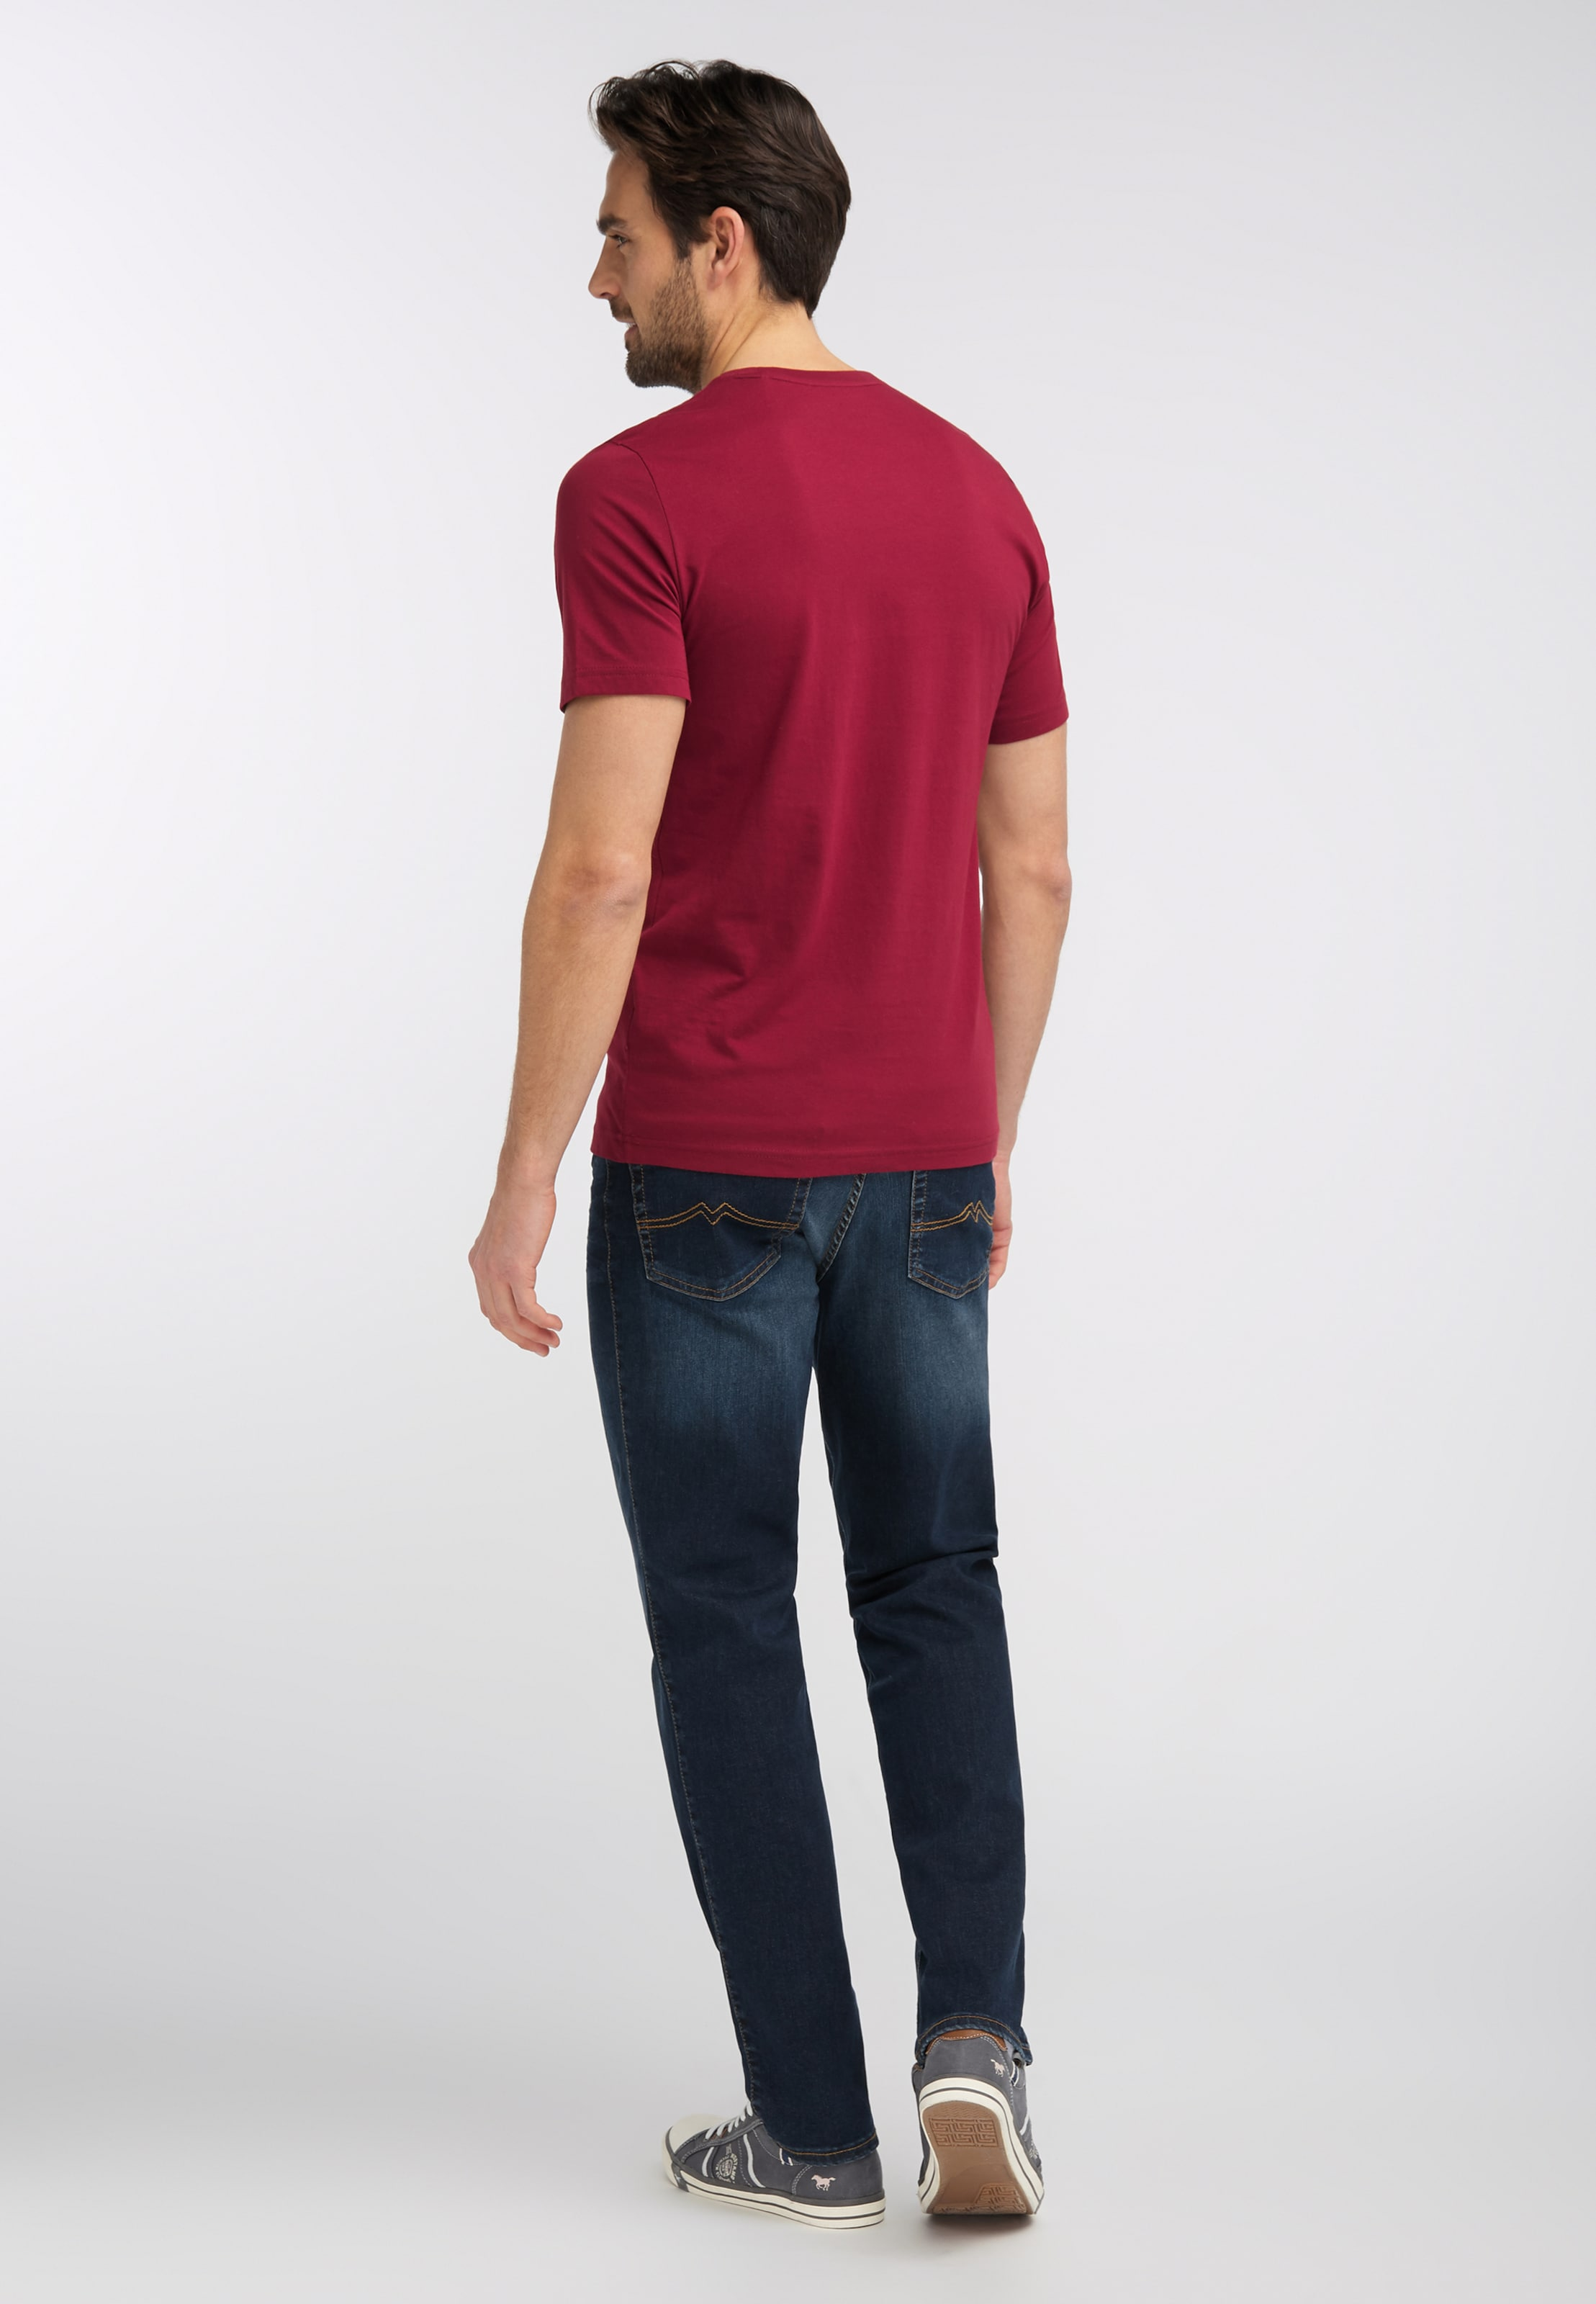 T DunkelblauDunkelrot 'logo In Mustang shirt Tee' Weiß BoQrdCxEWe